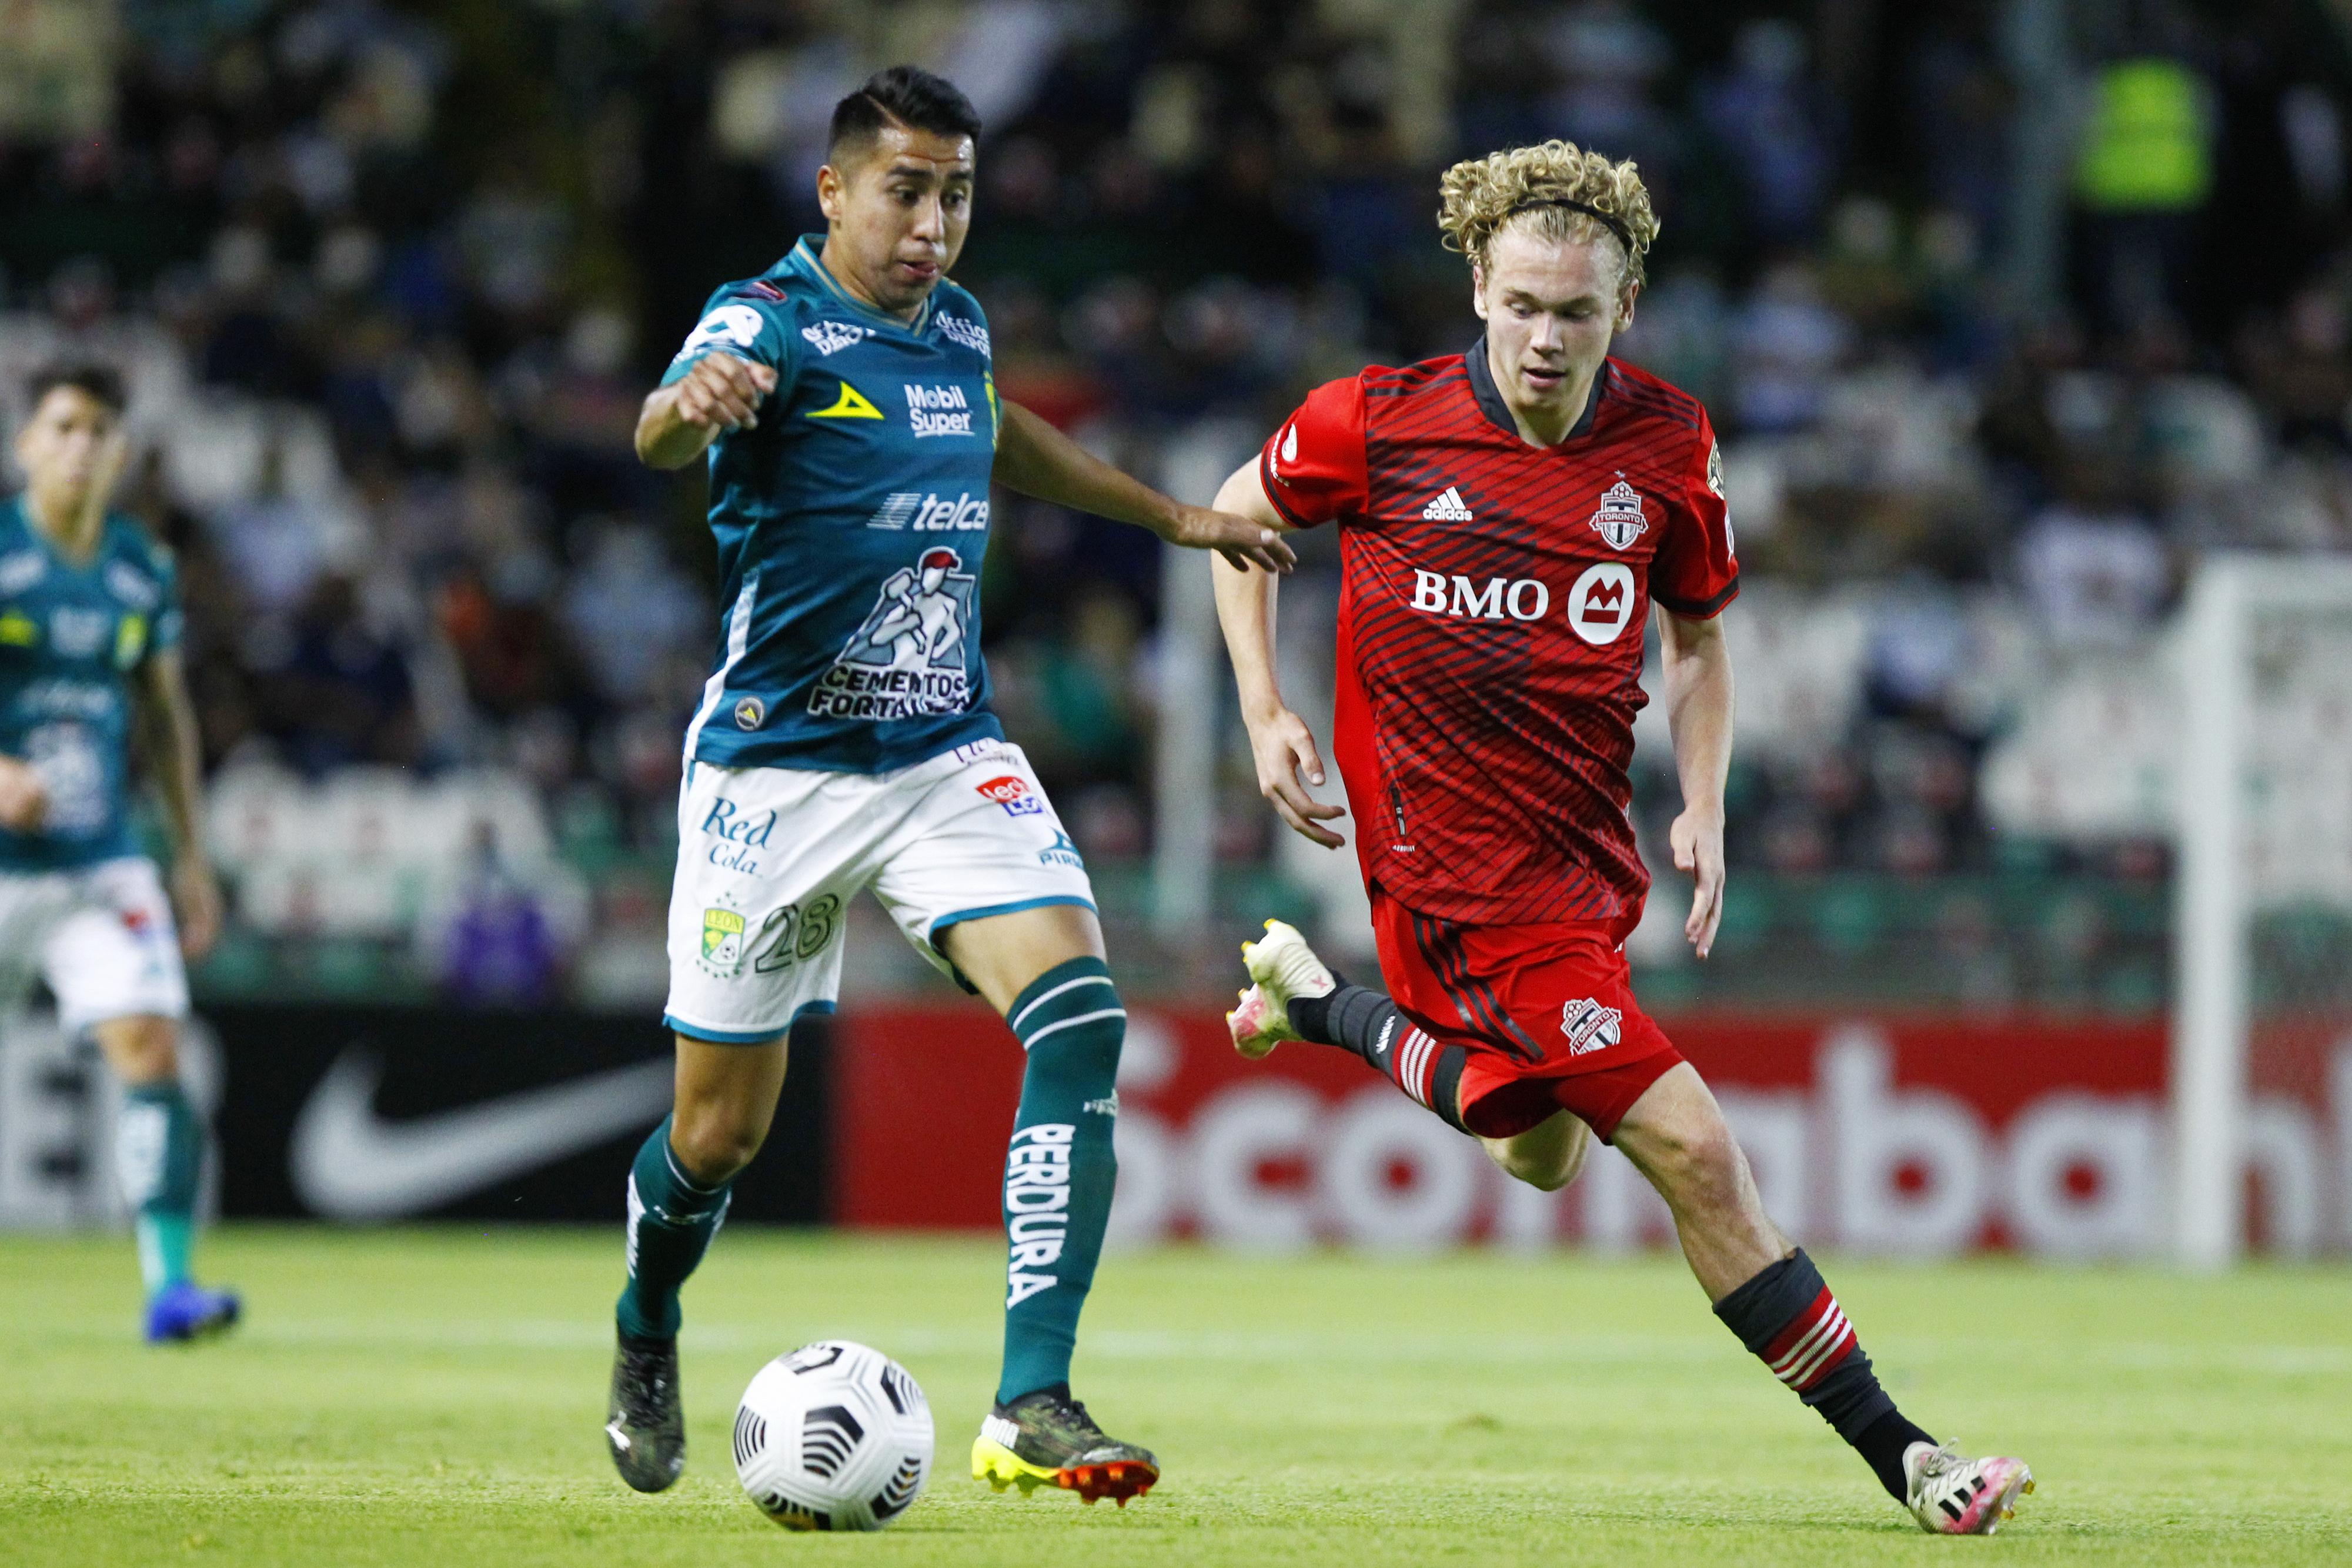 Leon v Toronto - Concacaf Champions League 2021